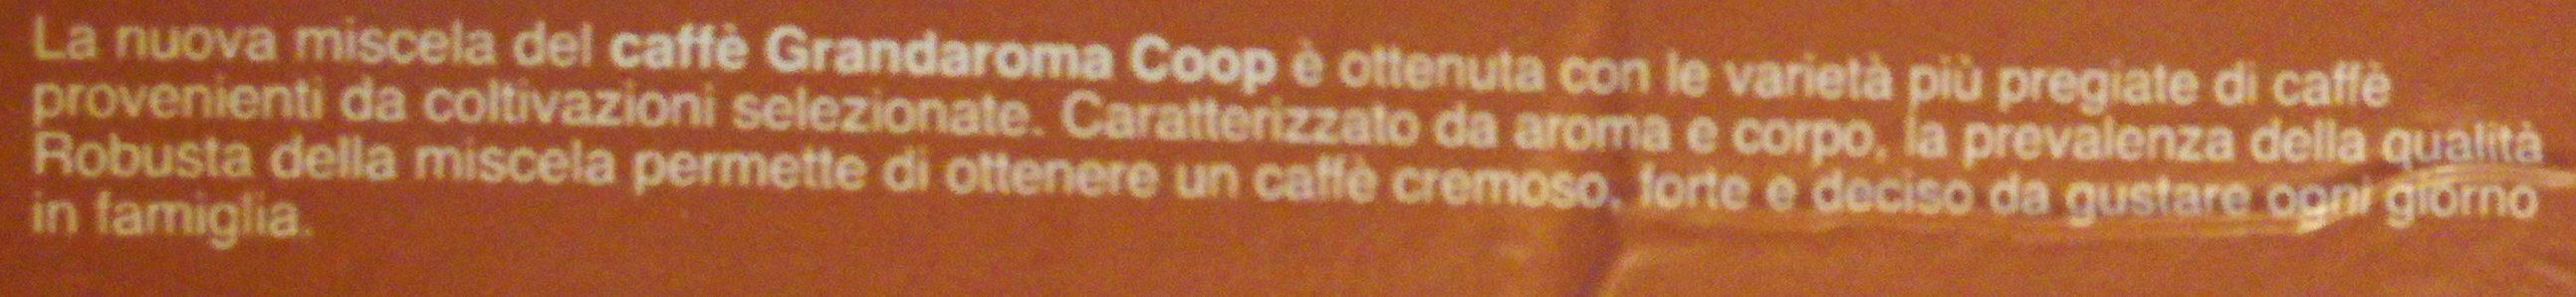 Caffè grandaroma macinato per moka - Ingrédients - it